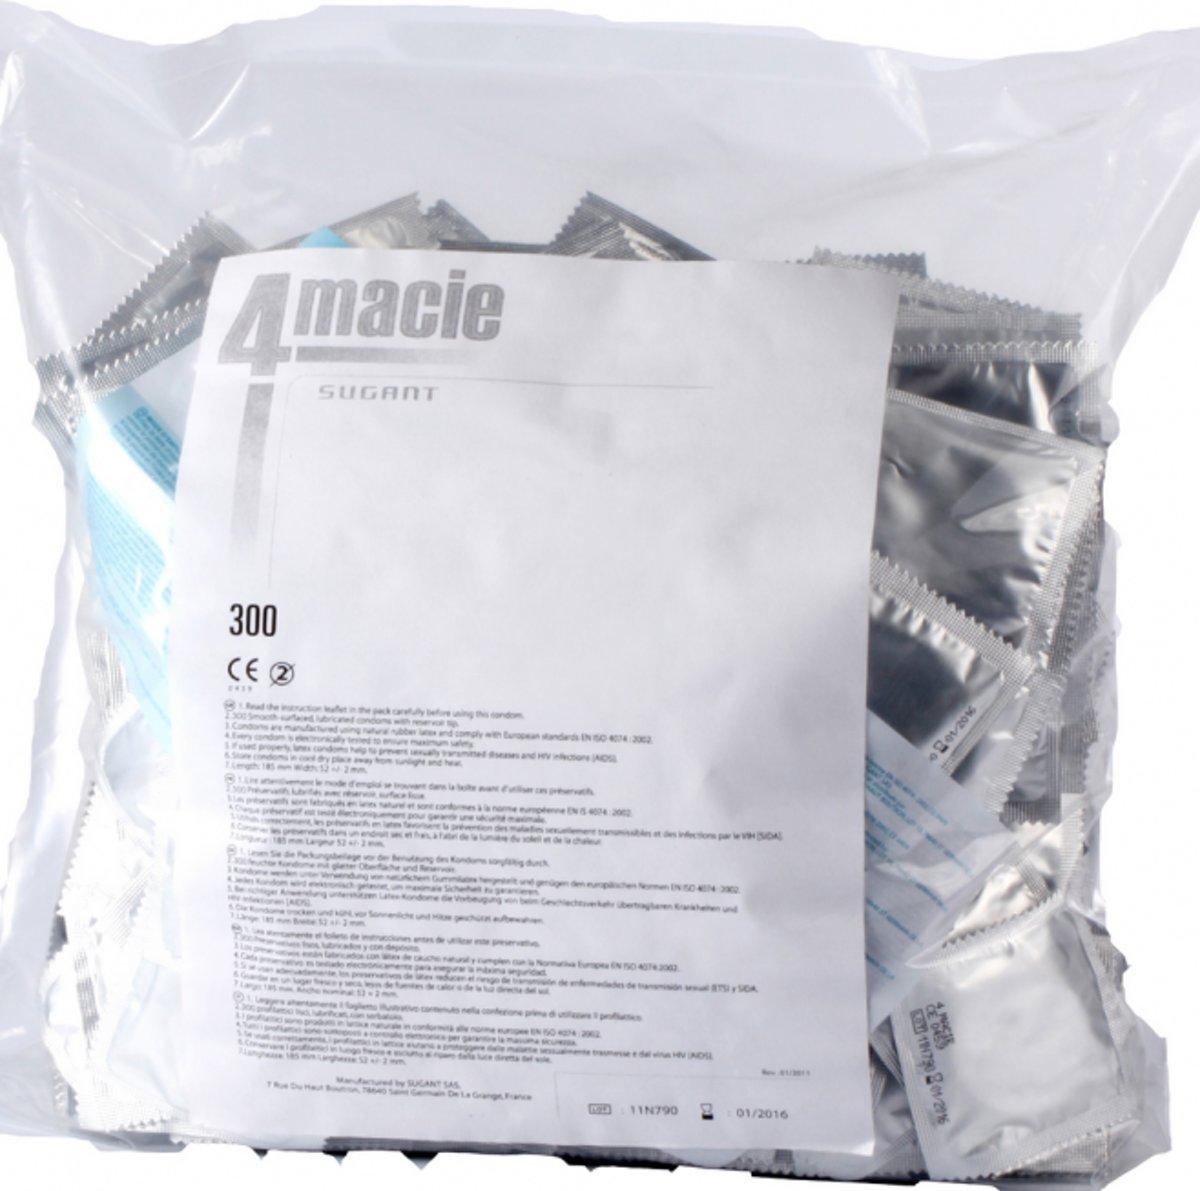 15 Condooms Veilig Vrijen - Sugant 4Macie Condooms kopen